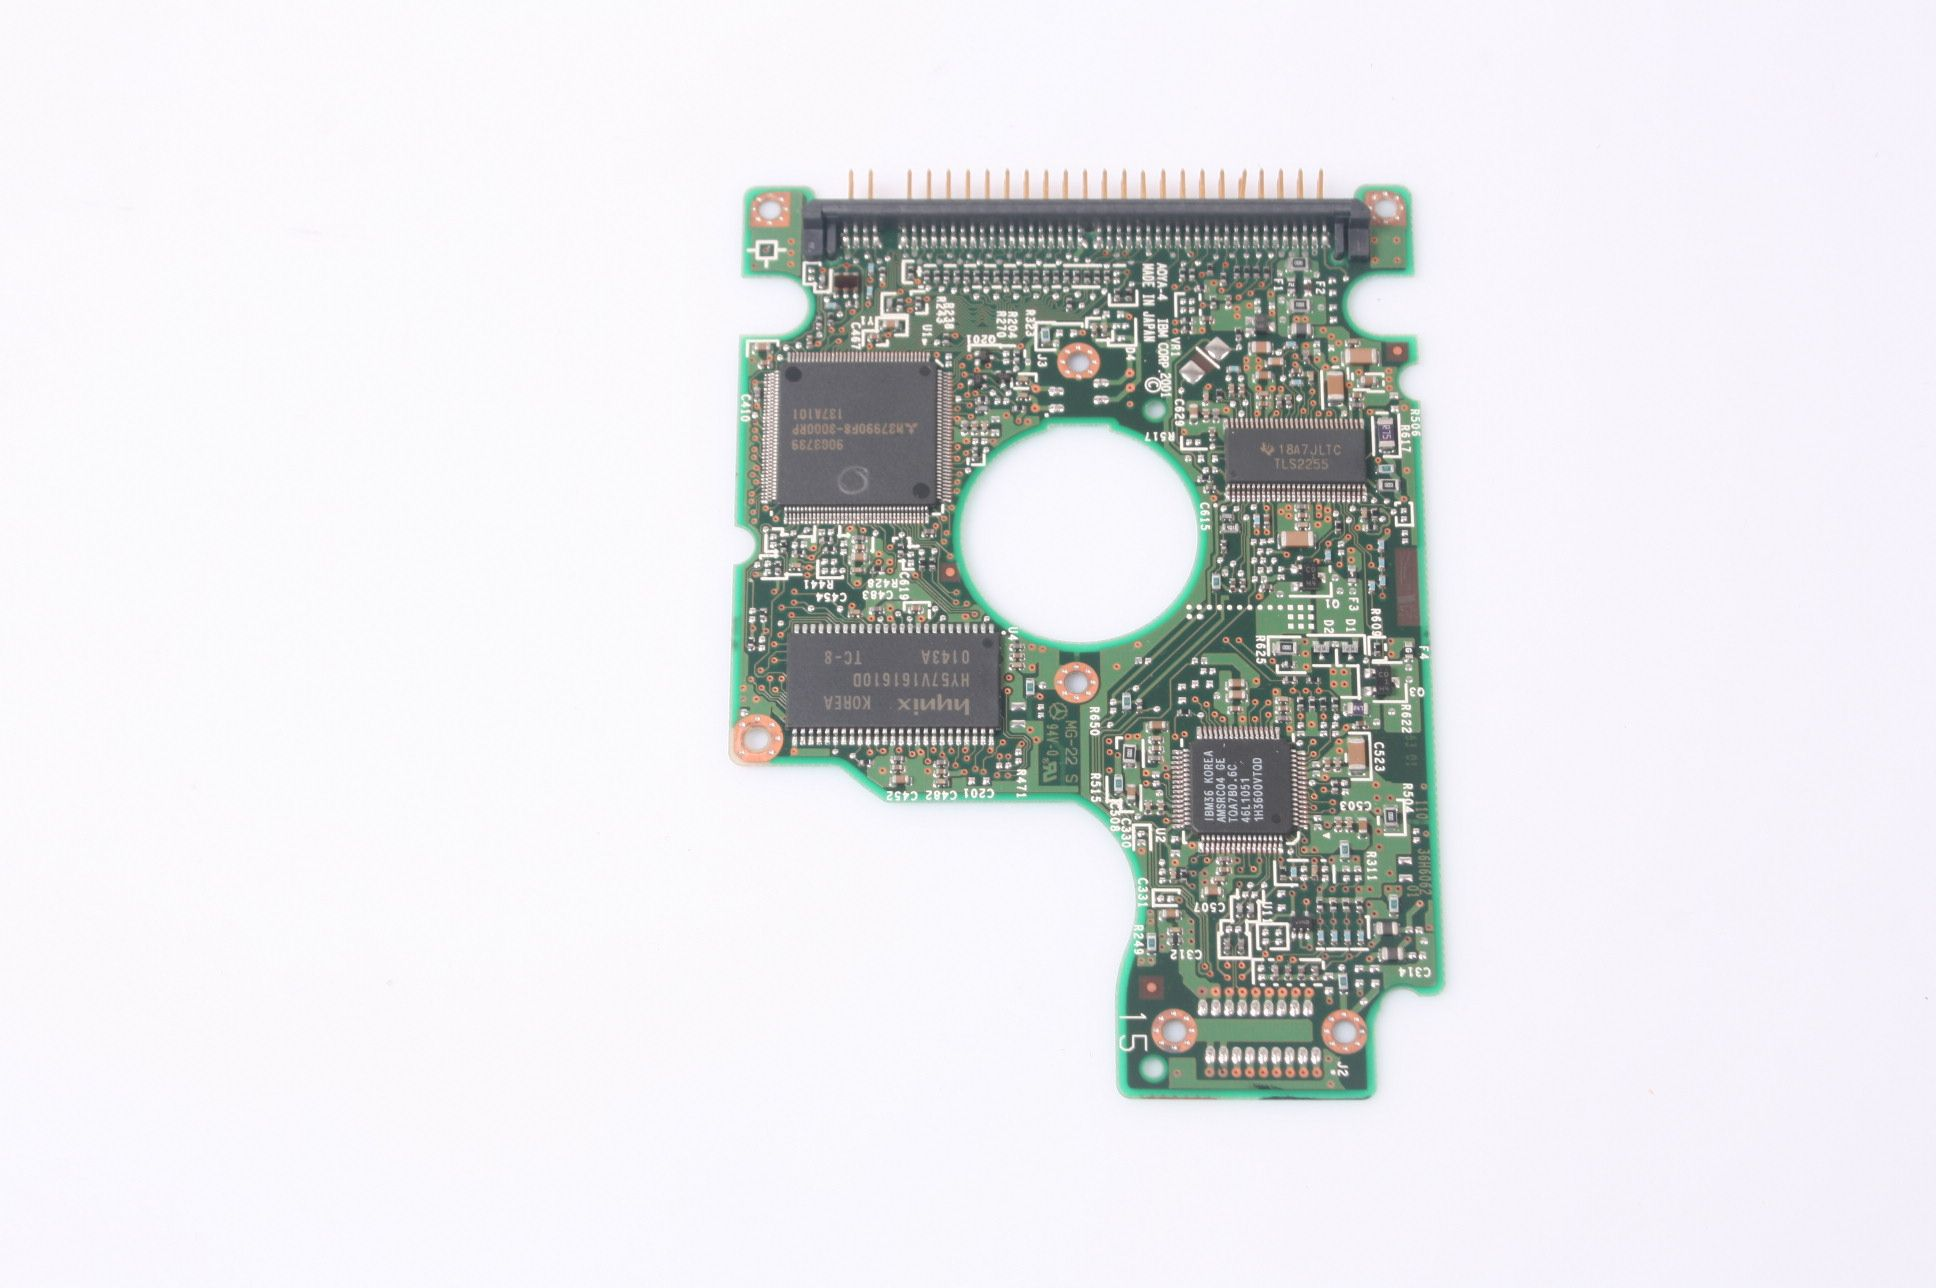 HITACHI HTS424040M9AT00 40GB 2.5 IDE HARD DRIVE / PCB (CIRCUIT BOARD) ONLY FOR DA